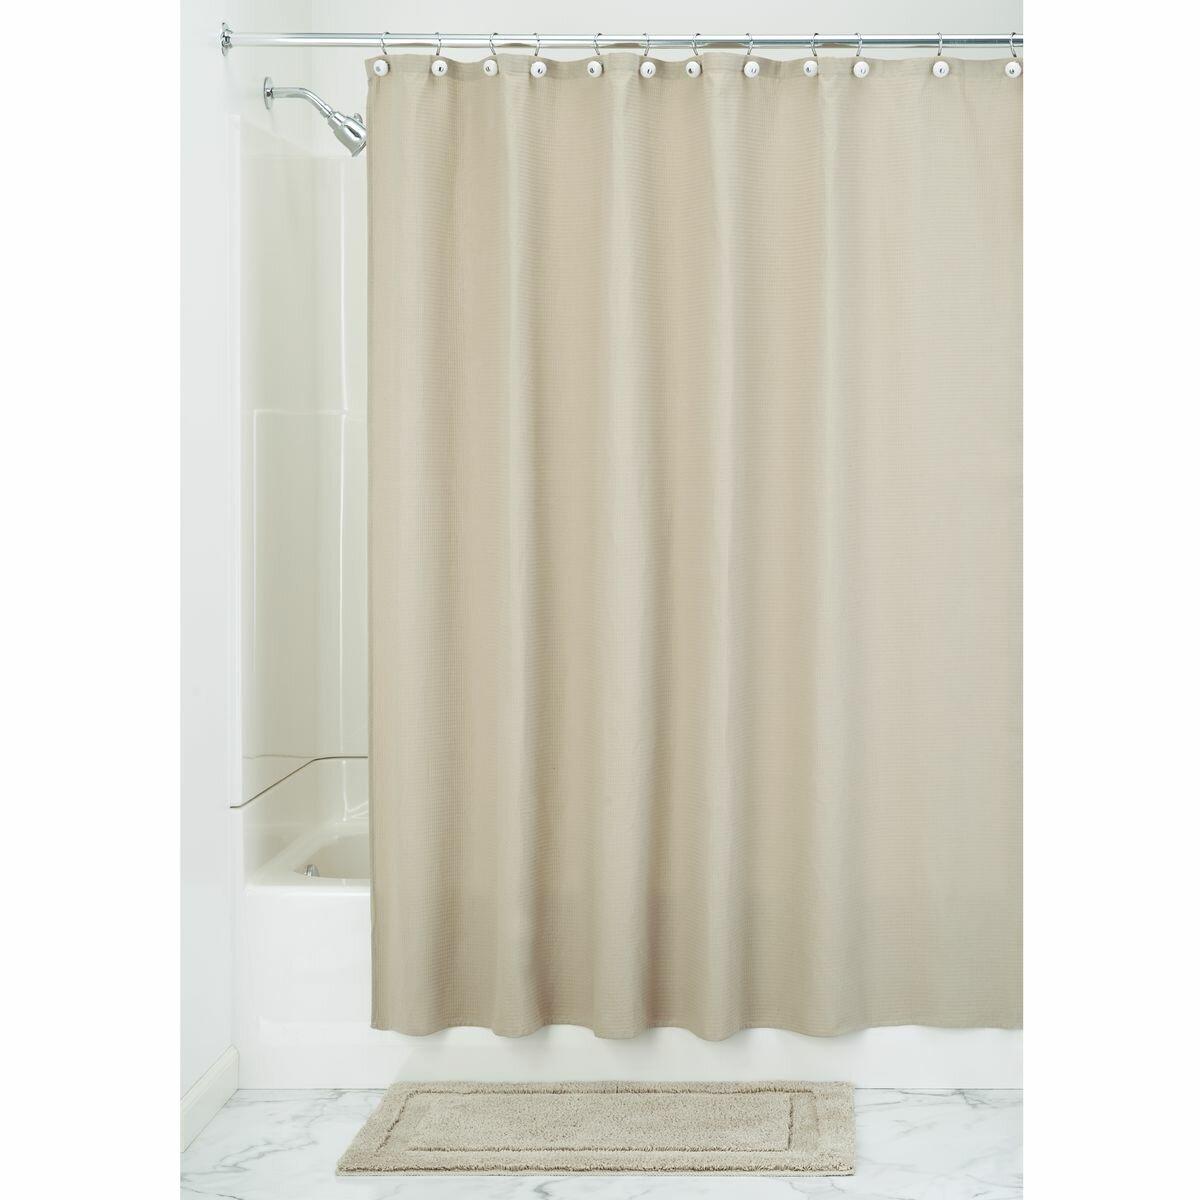 Interdesign york shower curtain reviews wayfair for Interdesign york